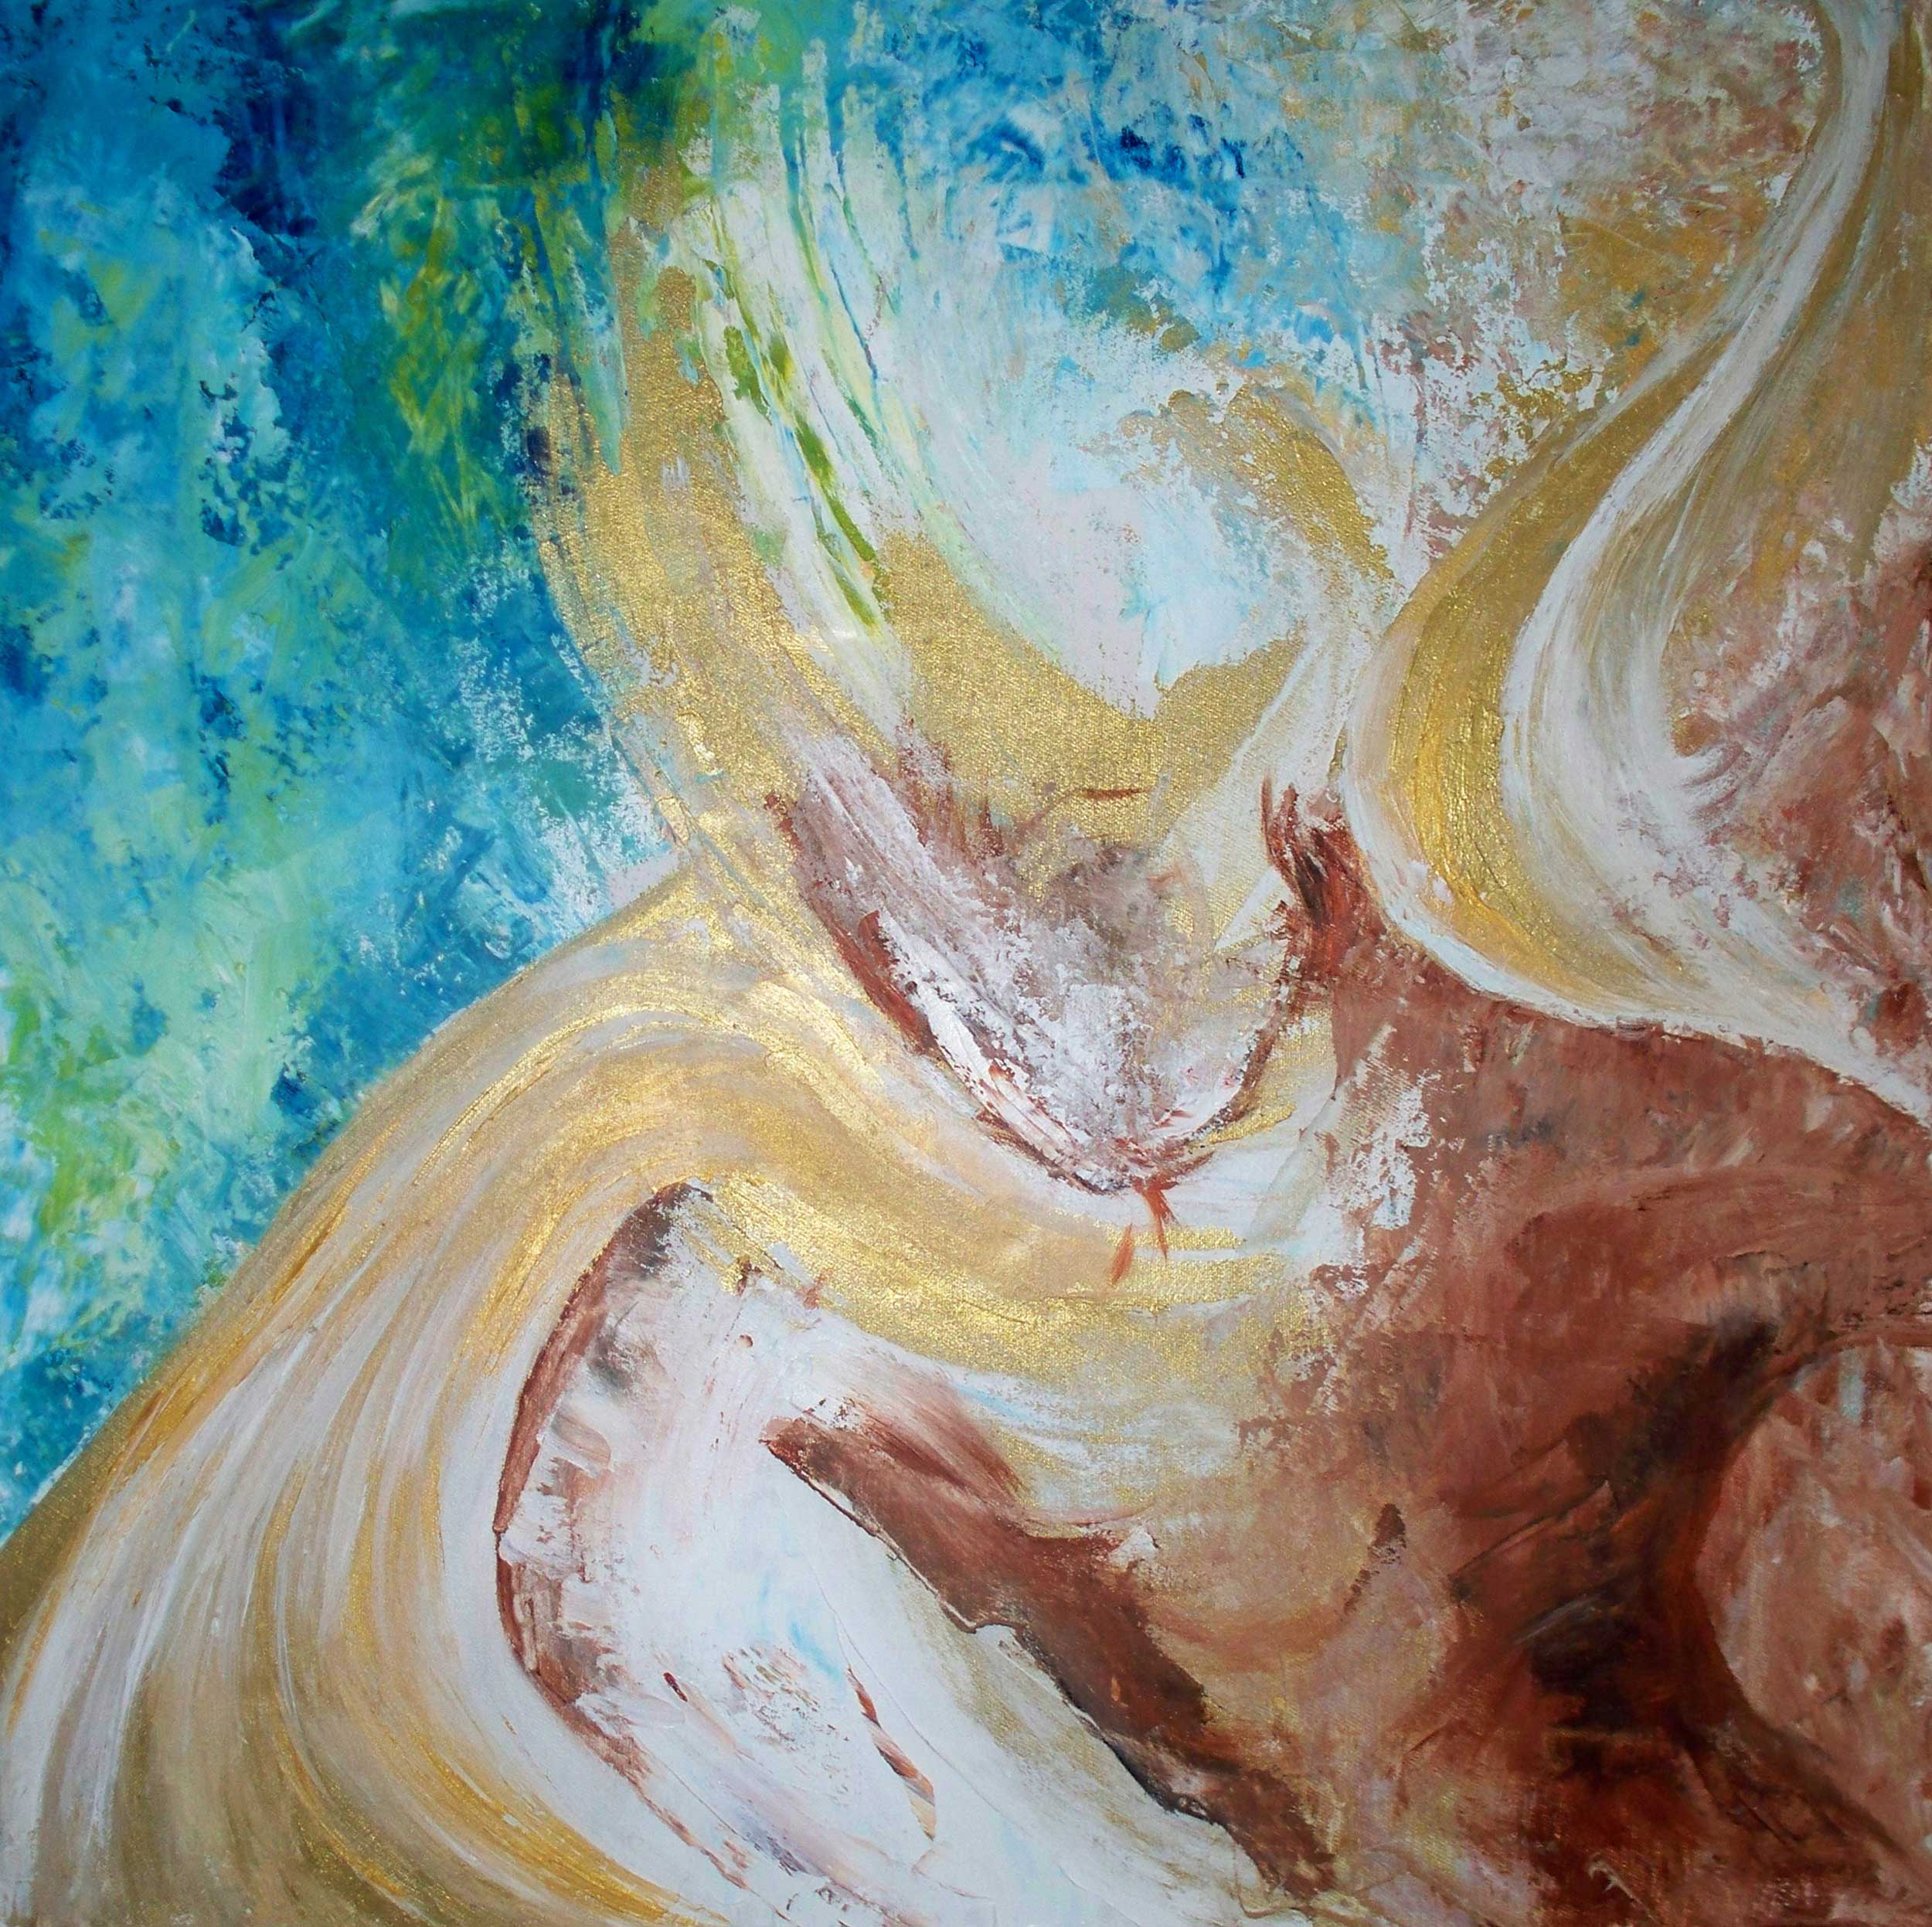 Into your arms - Rima Meyendorf